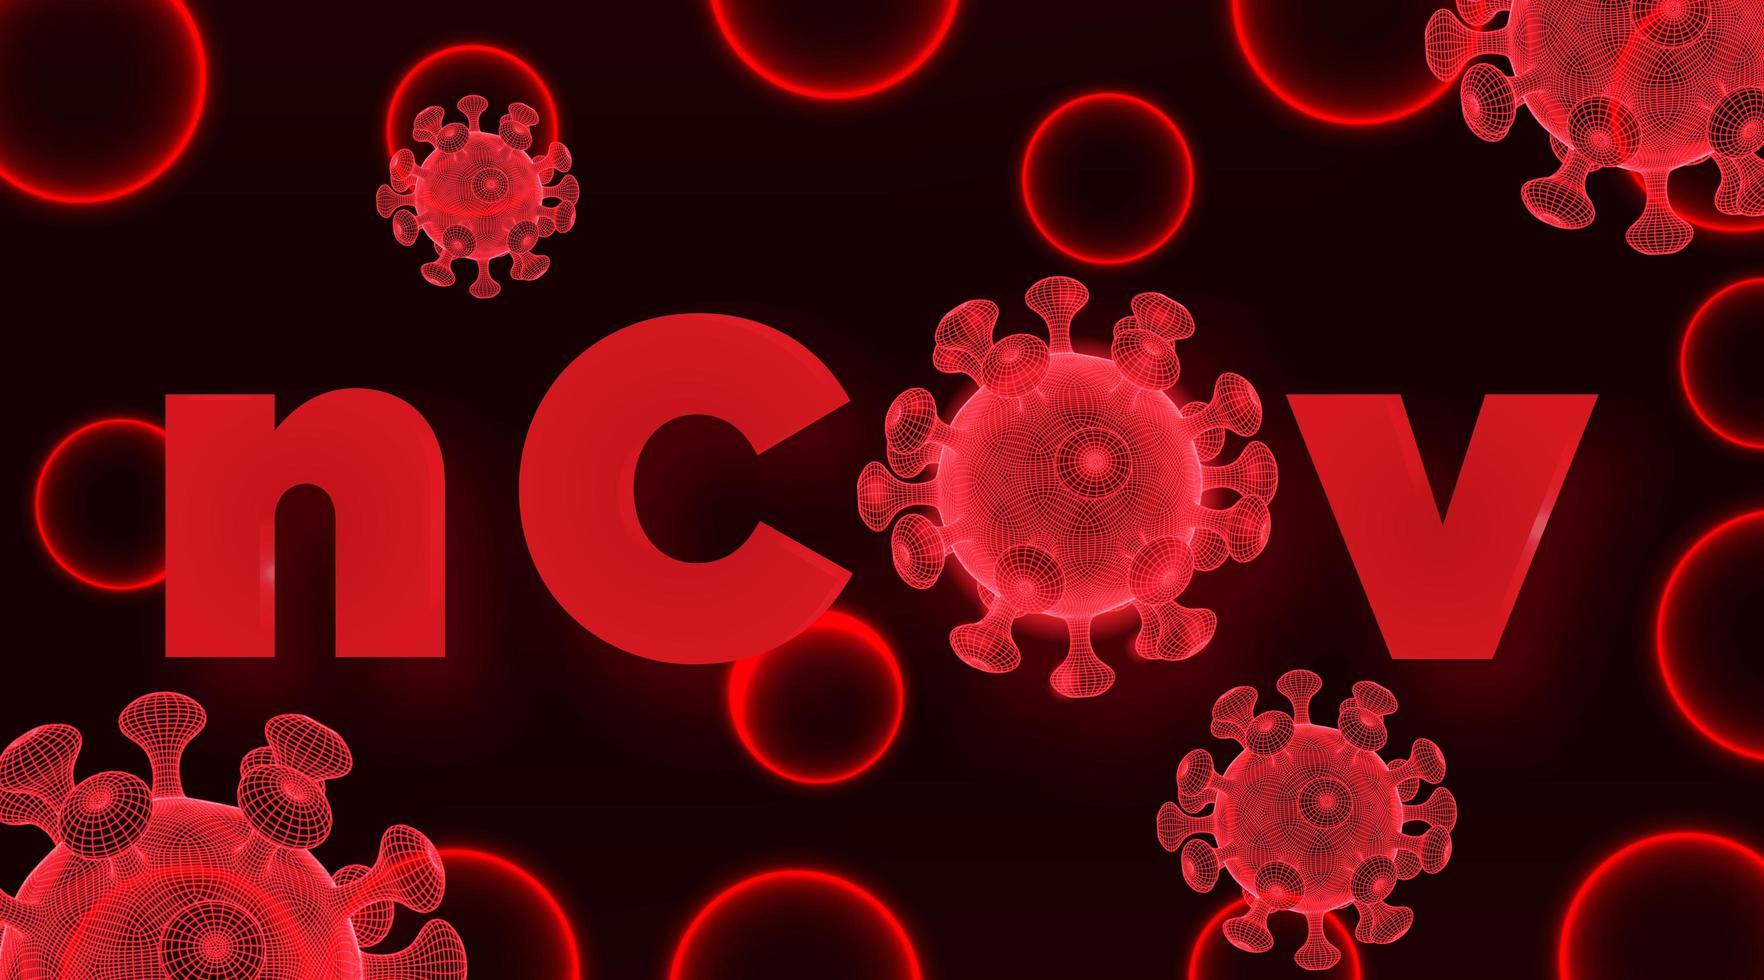 rote 2019-ncov Wireframe-Viruszellen vektor